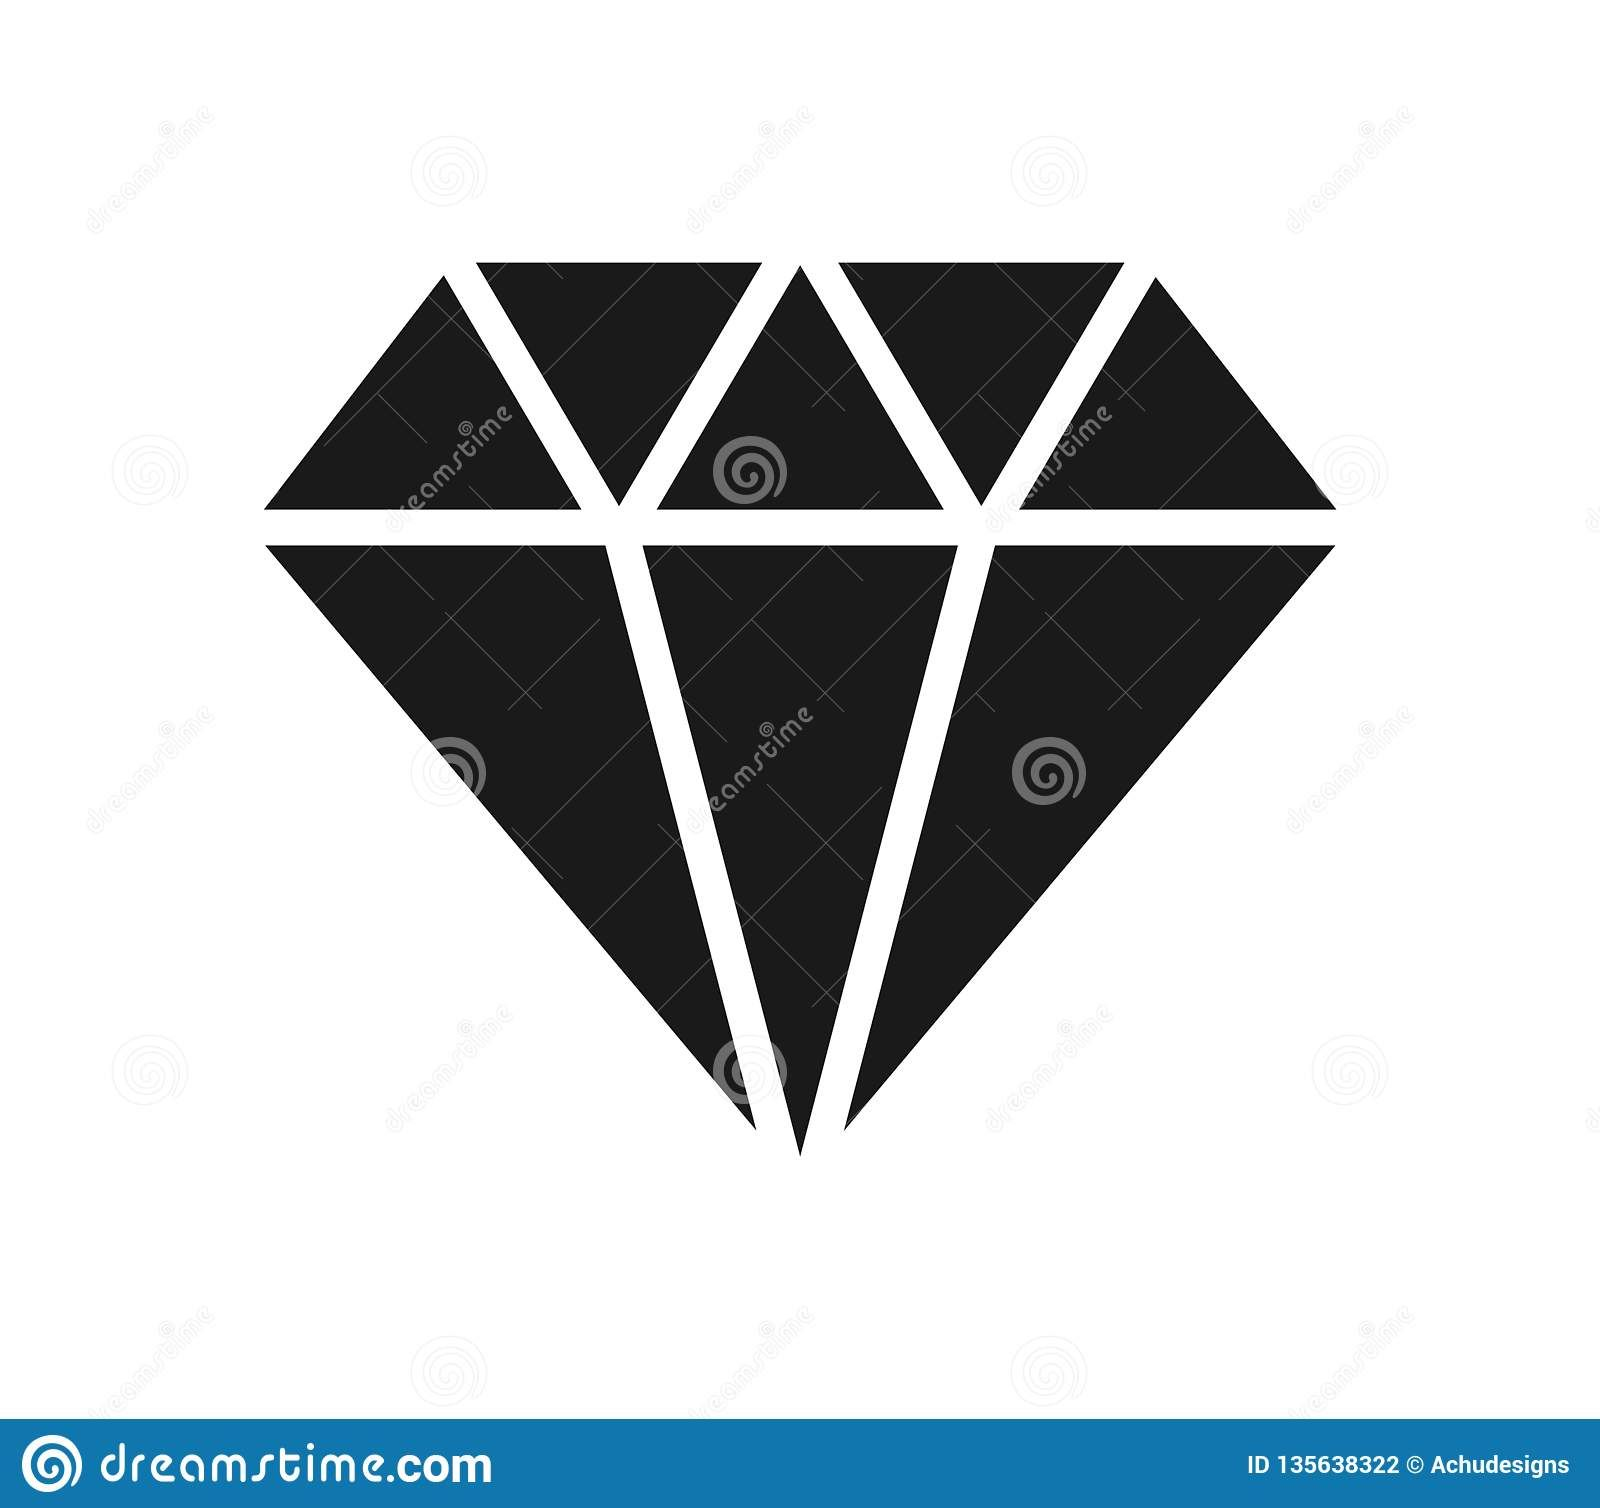 Pin By Michelle On Paparazzi Jewelry By Angel Diamond Picture Diamond Icon Bijou